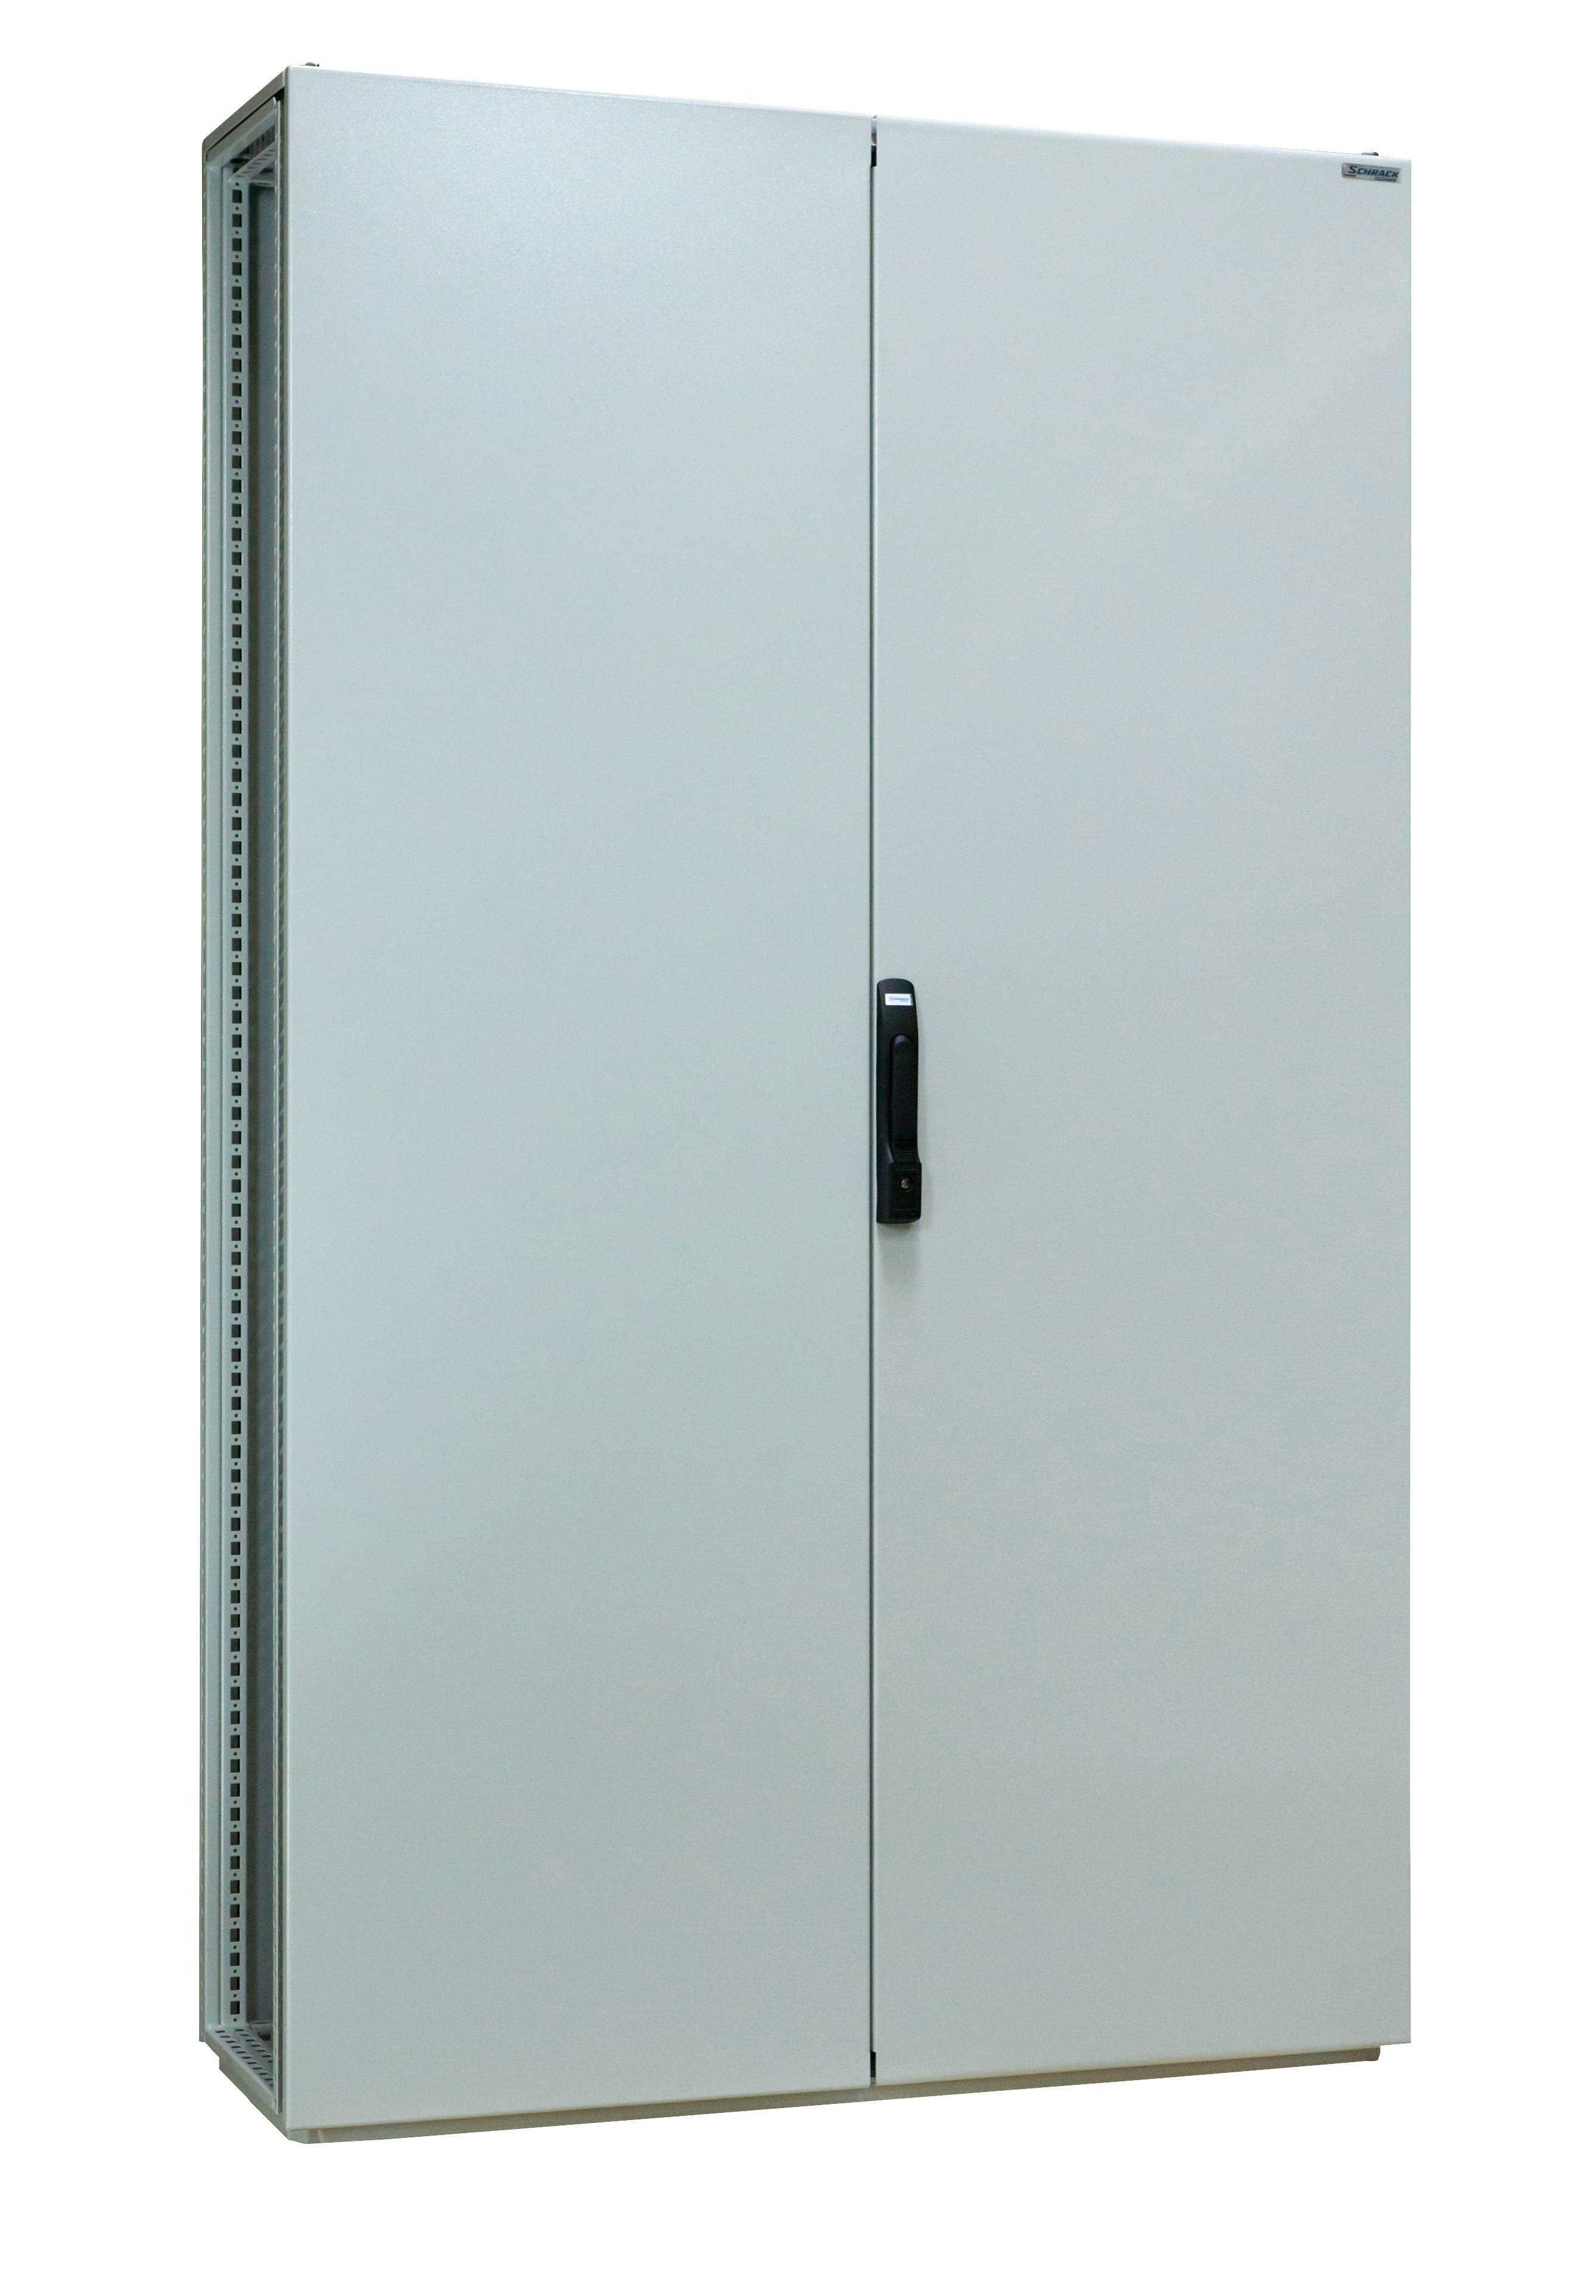 1 Stk Anreihschrank 2-türig, 2000x1600x400mm, RAL 7035 AS201642-5